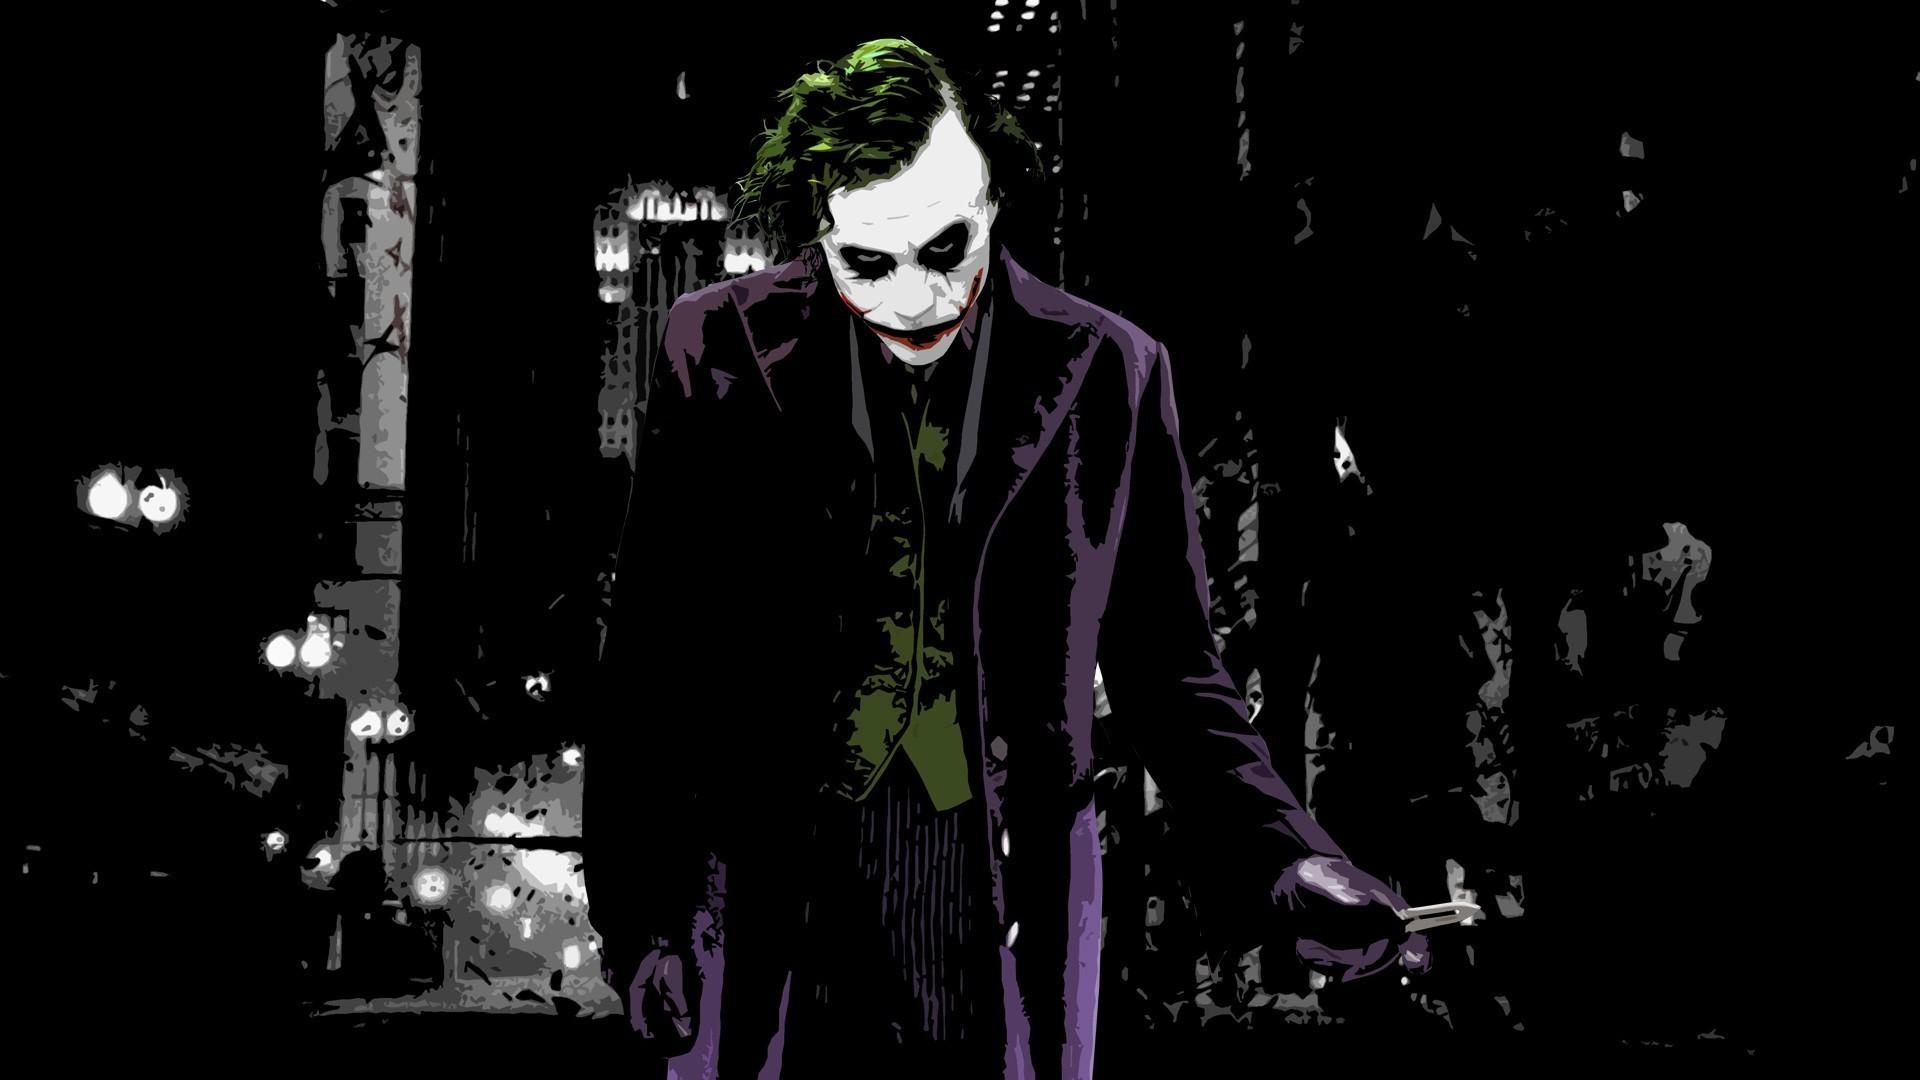 digital Art, Batman Begins, Joker, Knife, Butterfly Knives, Batman,  Painting, The Dark Knight Wallpapers HD / Desktop and Mobile Backgrounds